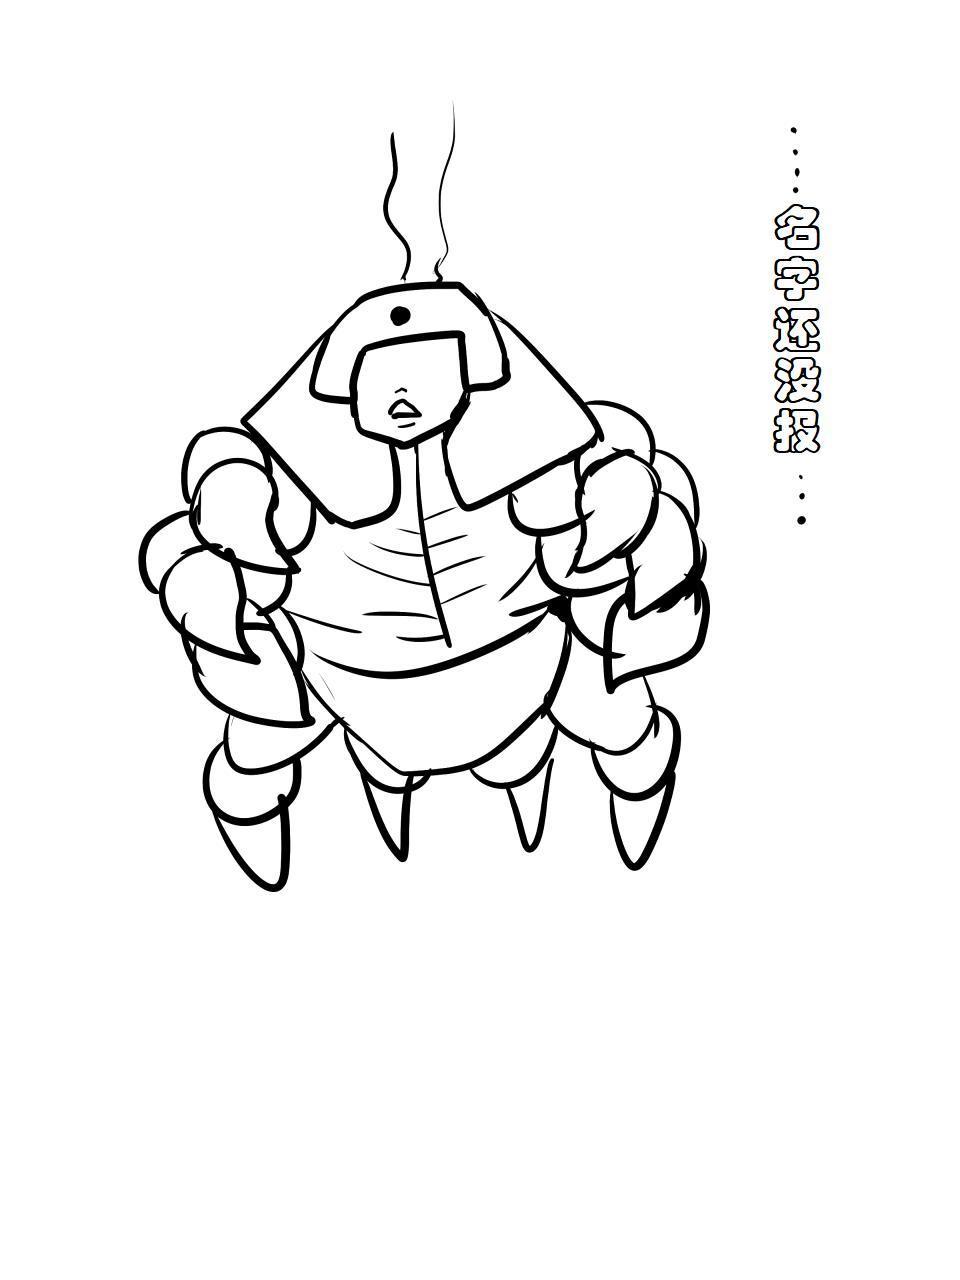 [Atelier Hachifukuan] Superheroine Yuukai Ryoujoku III - Superheroine in Distress [Chrome Rose Bell]   凌辱诱拐3 [Chinese] [有条色狼汉化] 35